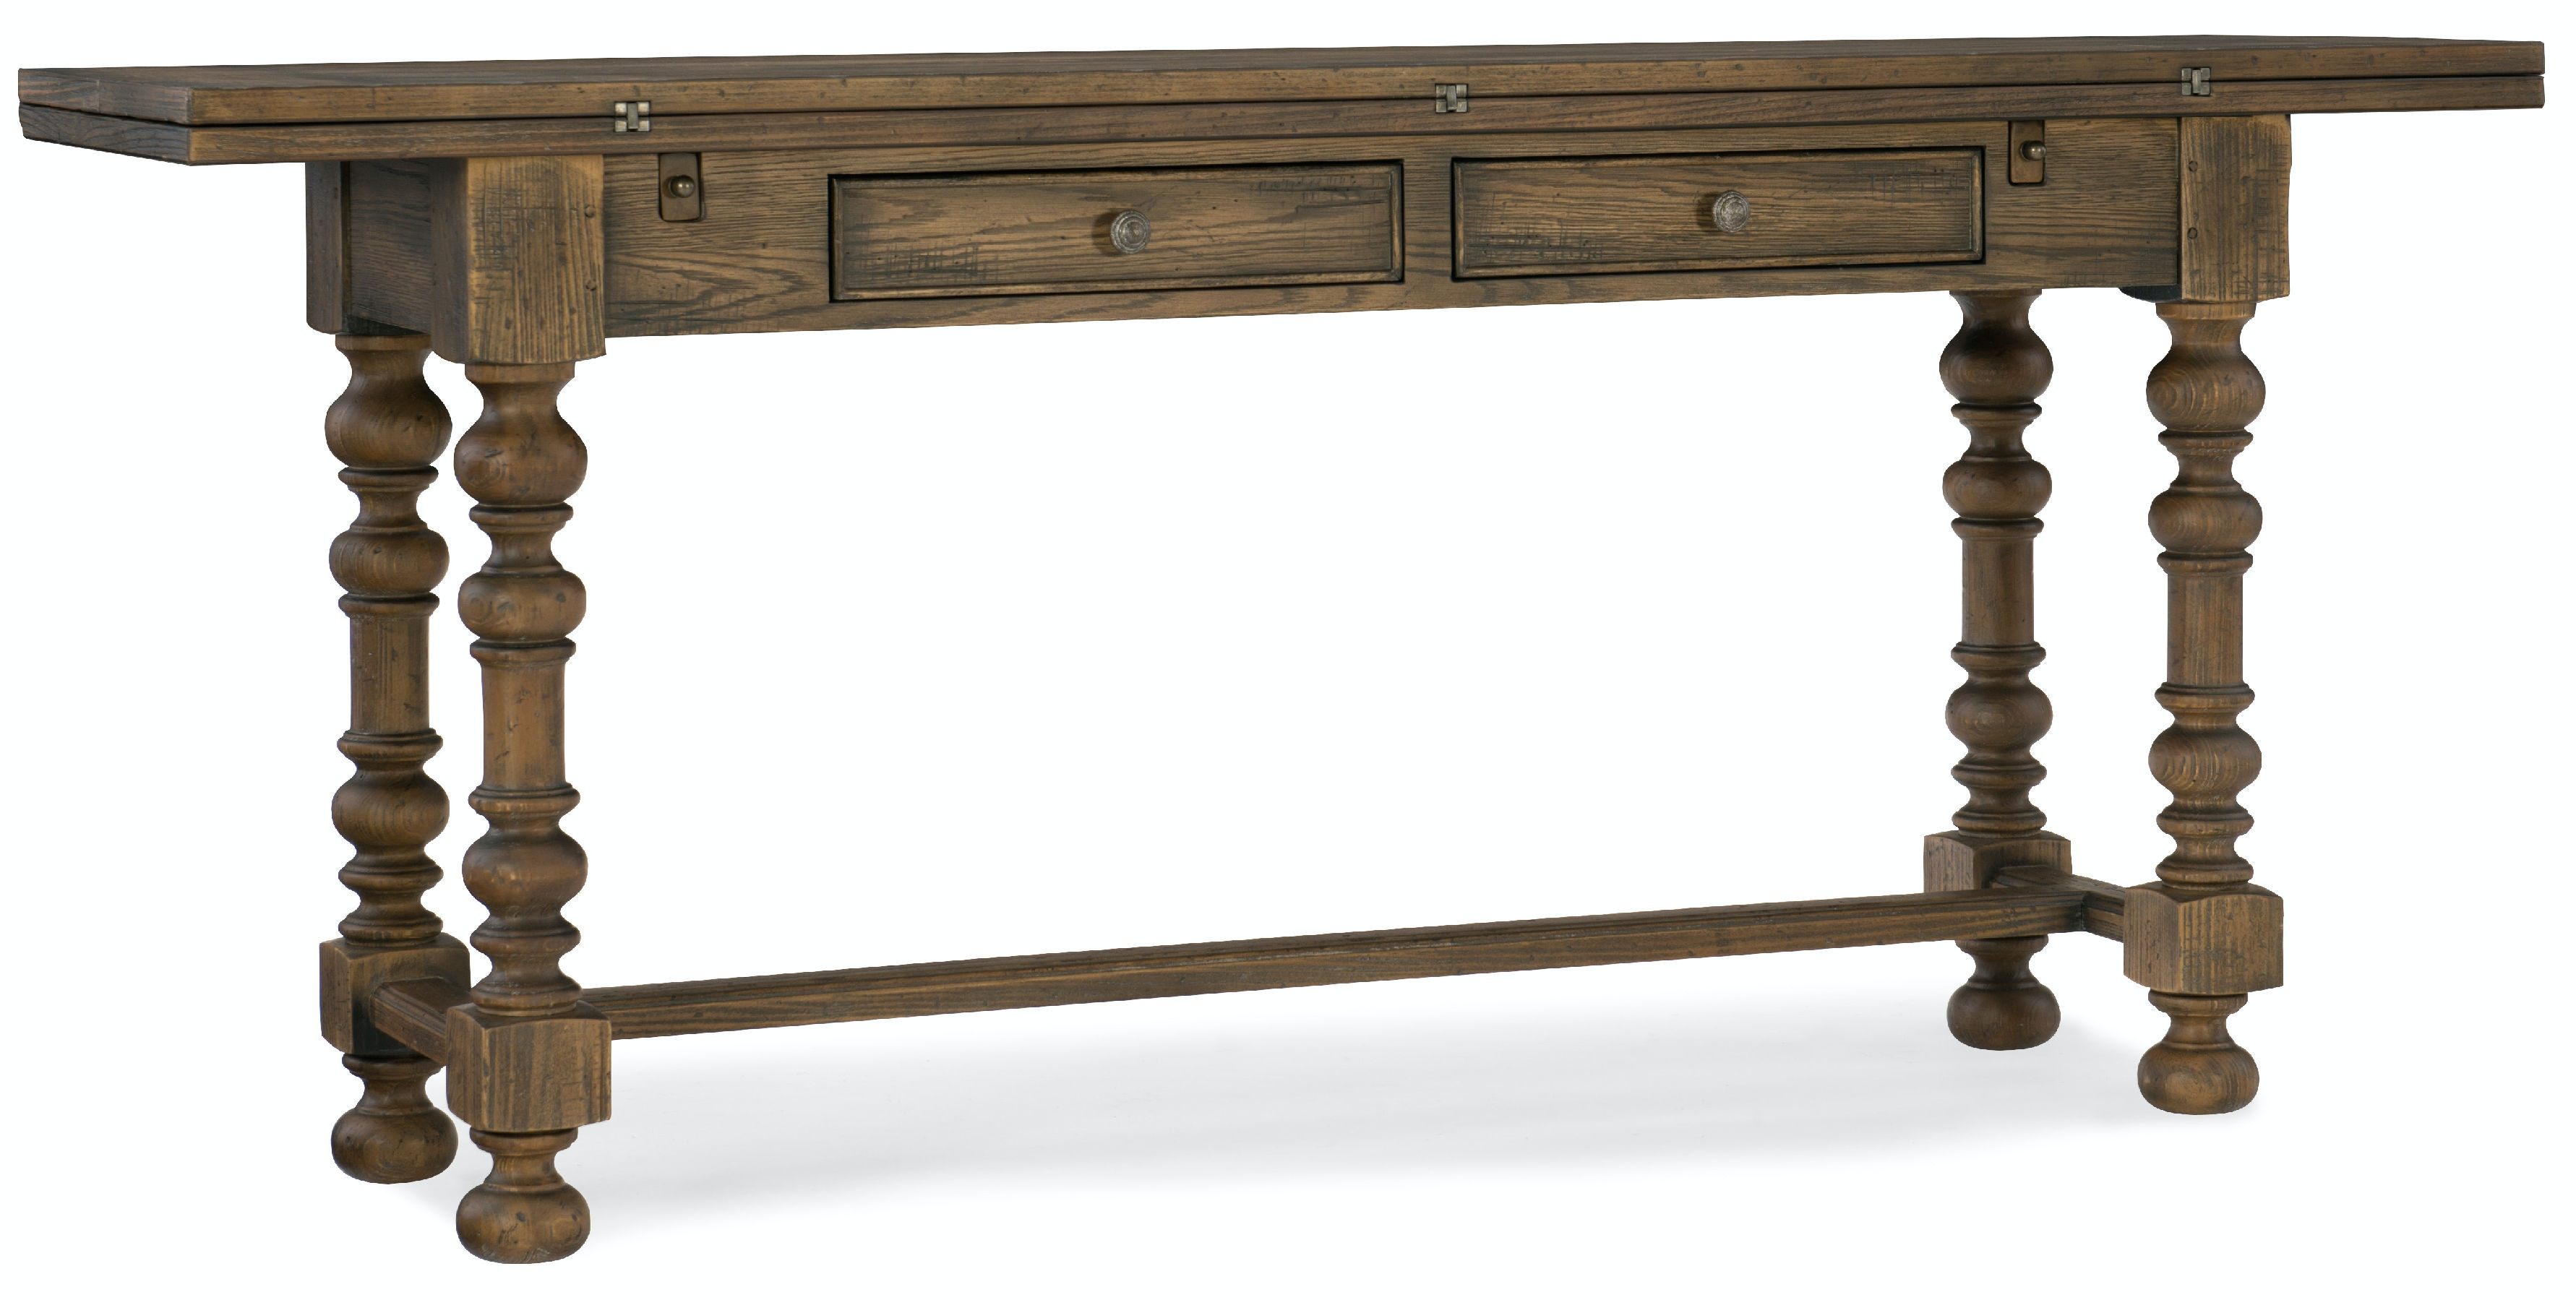 Great Hooker Furniture Bluewind Flip Top Console Table 5960 85001 BRN